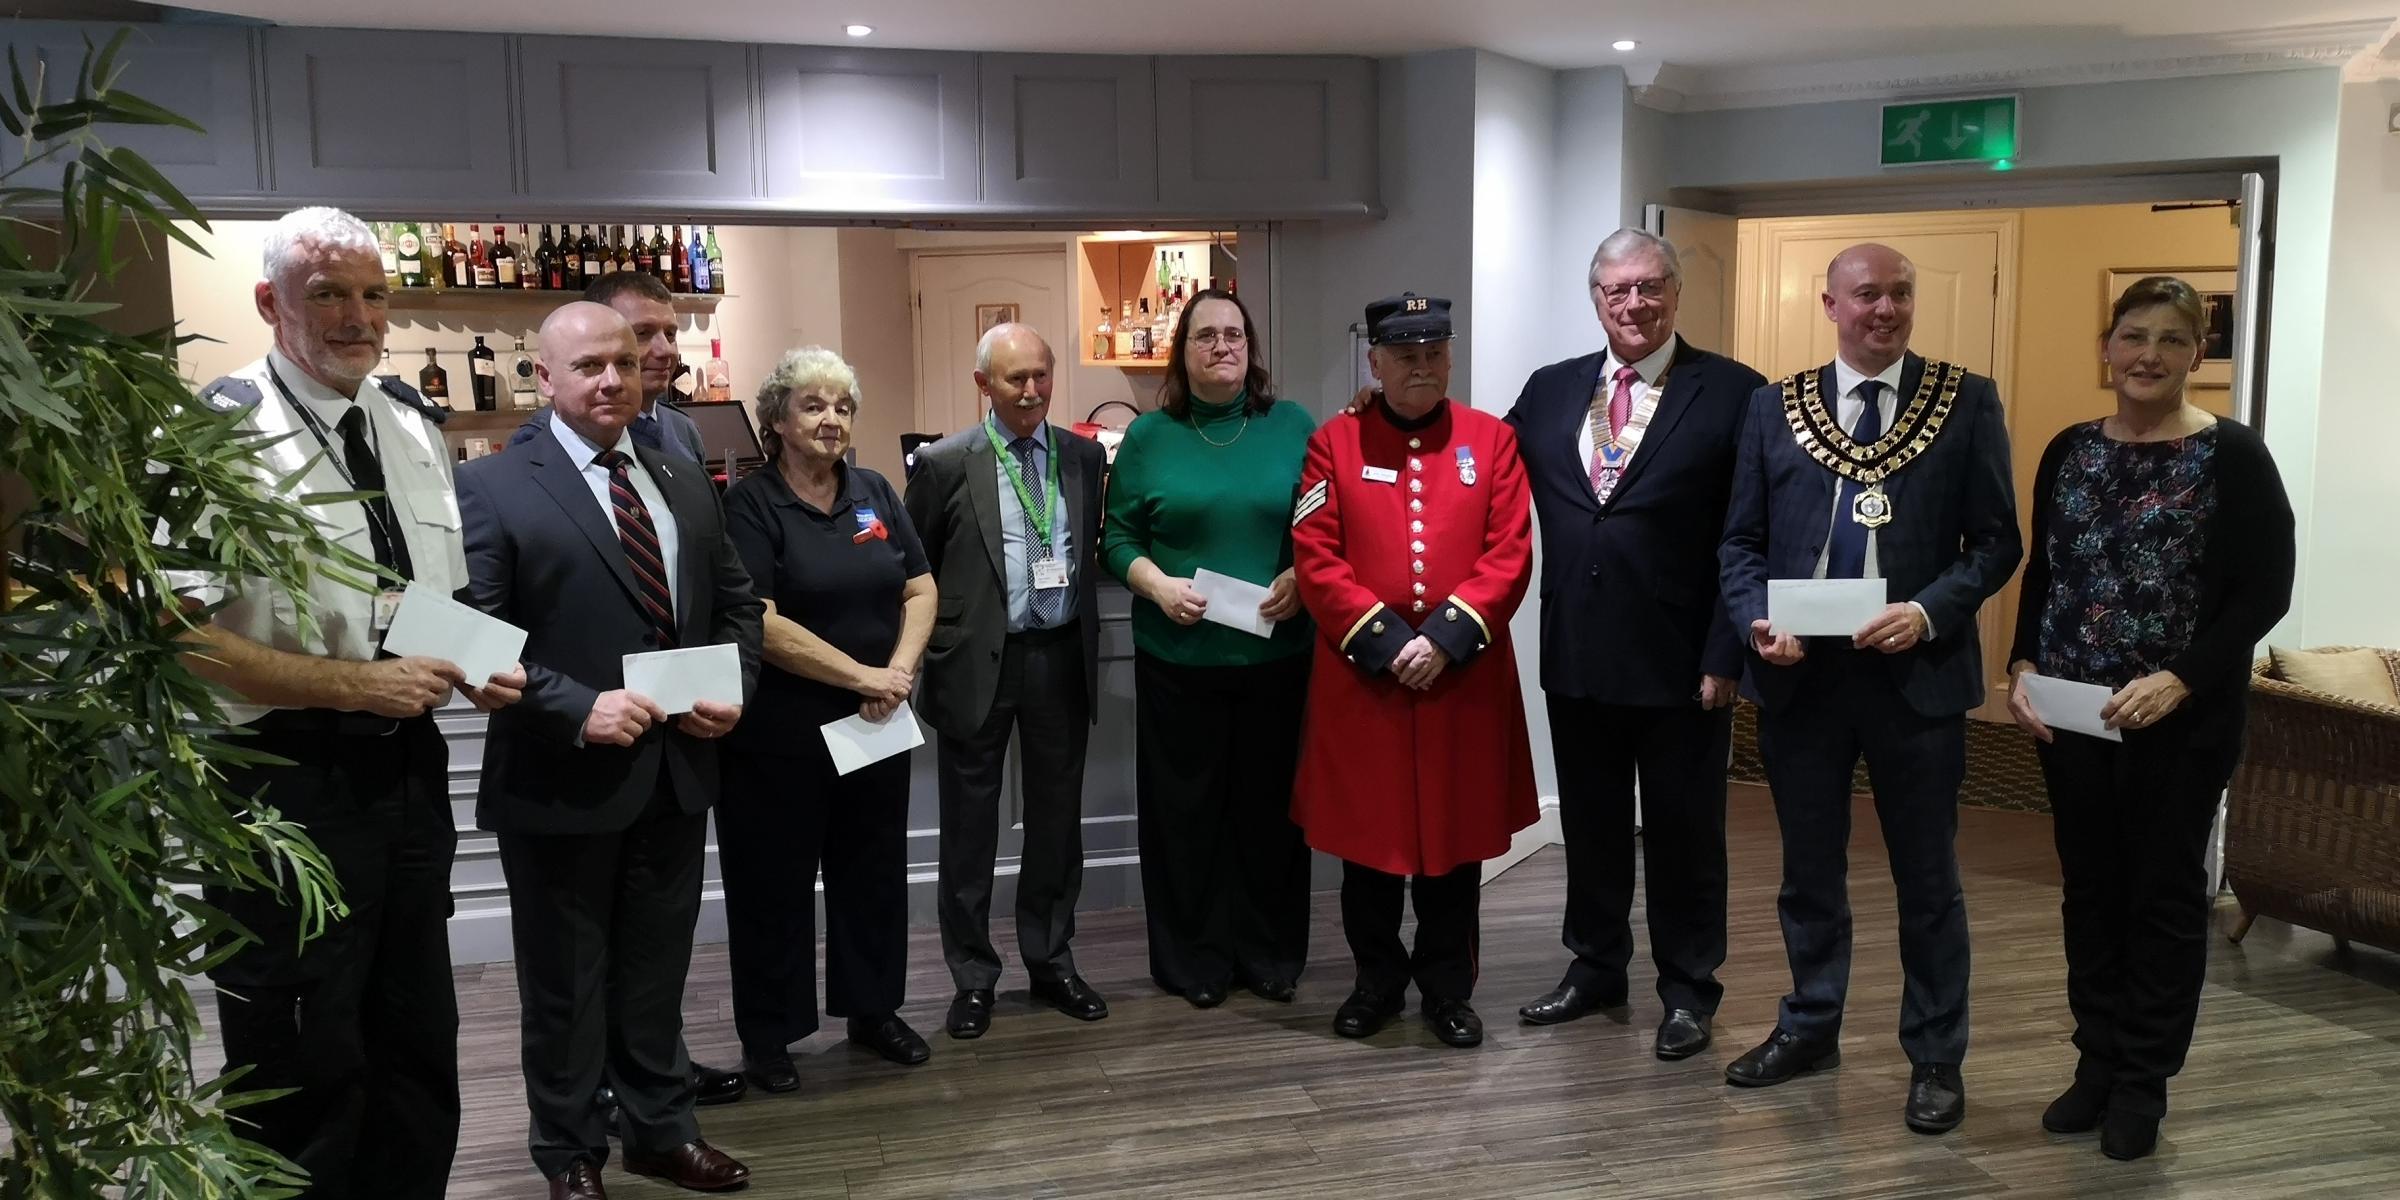 Thamesdown Rotary Club celebrates fundraising success